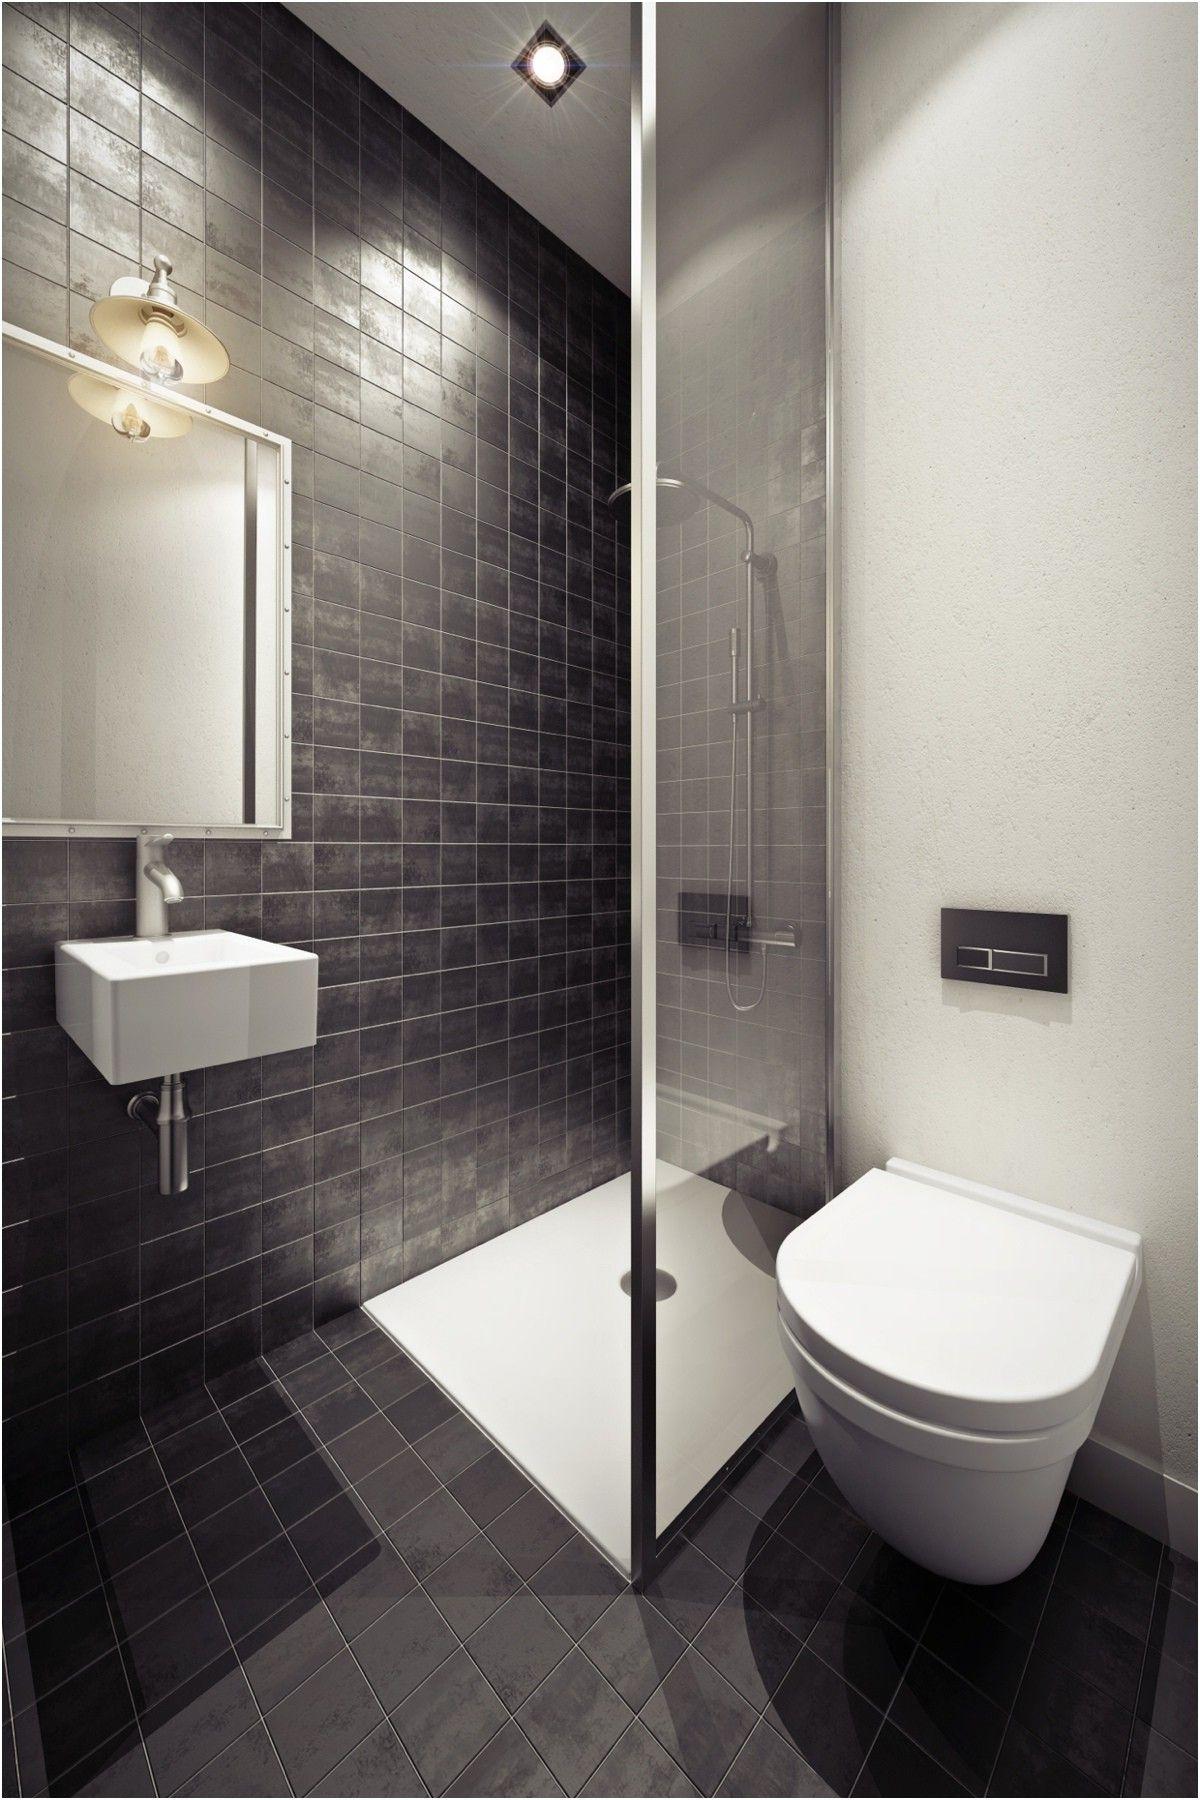 28 Small Square Bathroom Layout Small Bathroom Layout Plans From Small Square Bathroom Designs Modern Bathroom Bathroom Shower Design Modern Bathroom Design